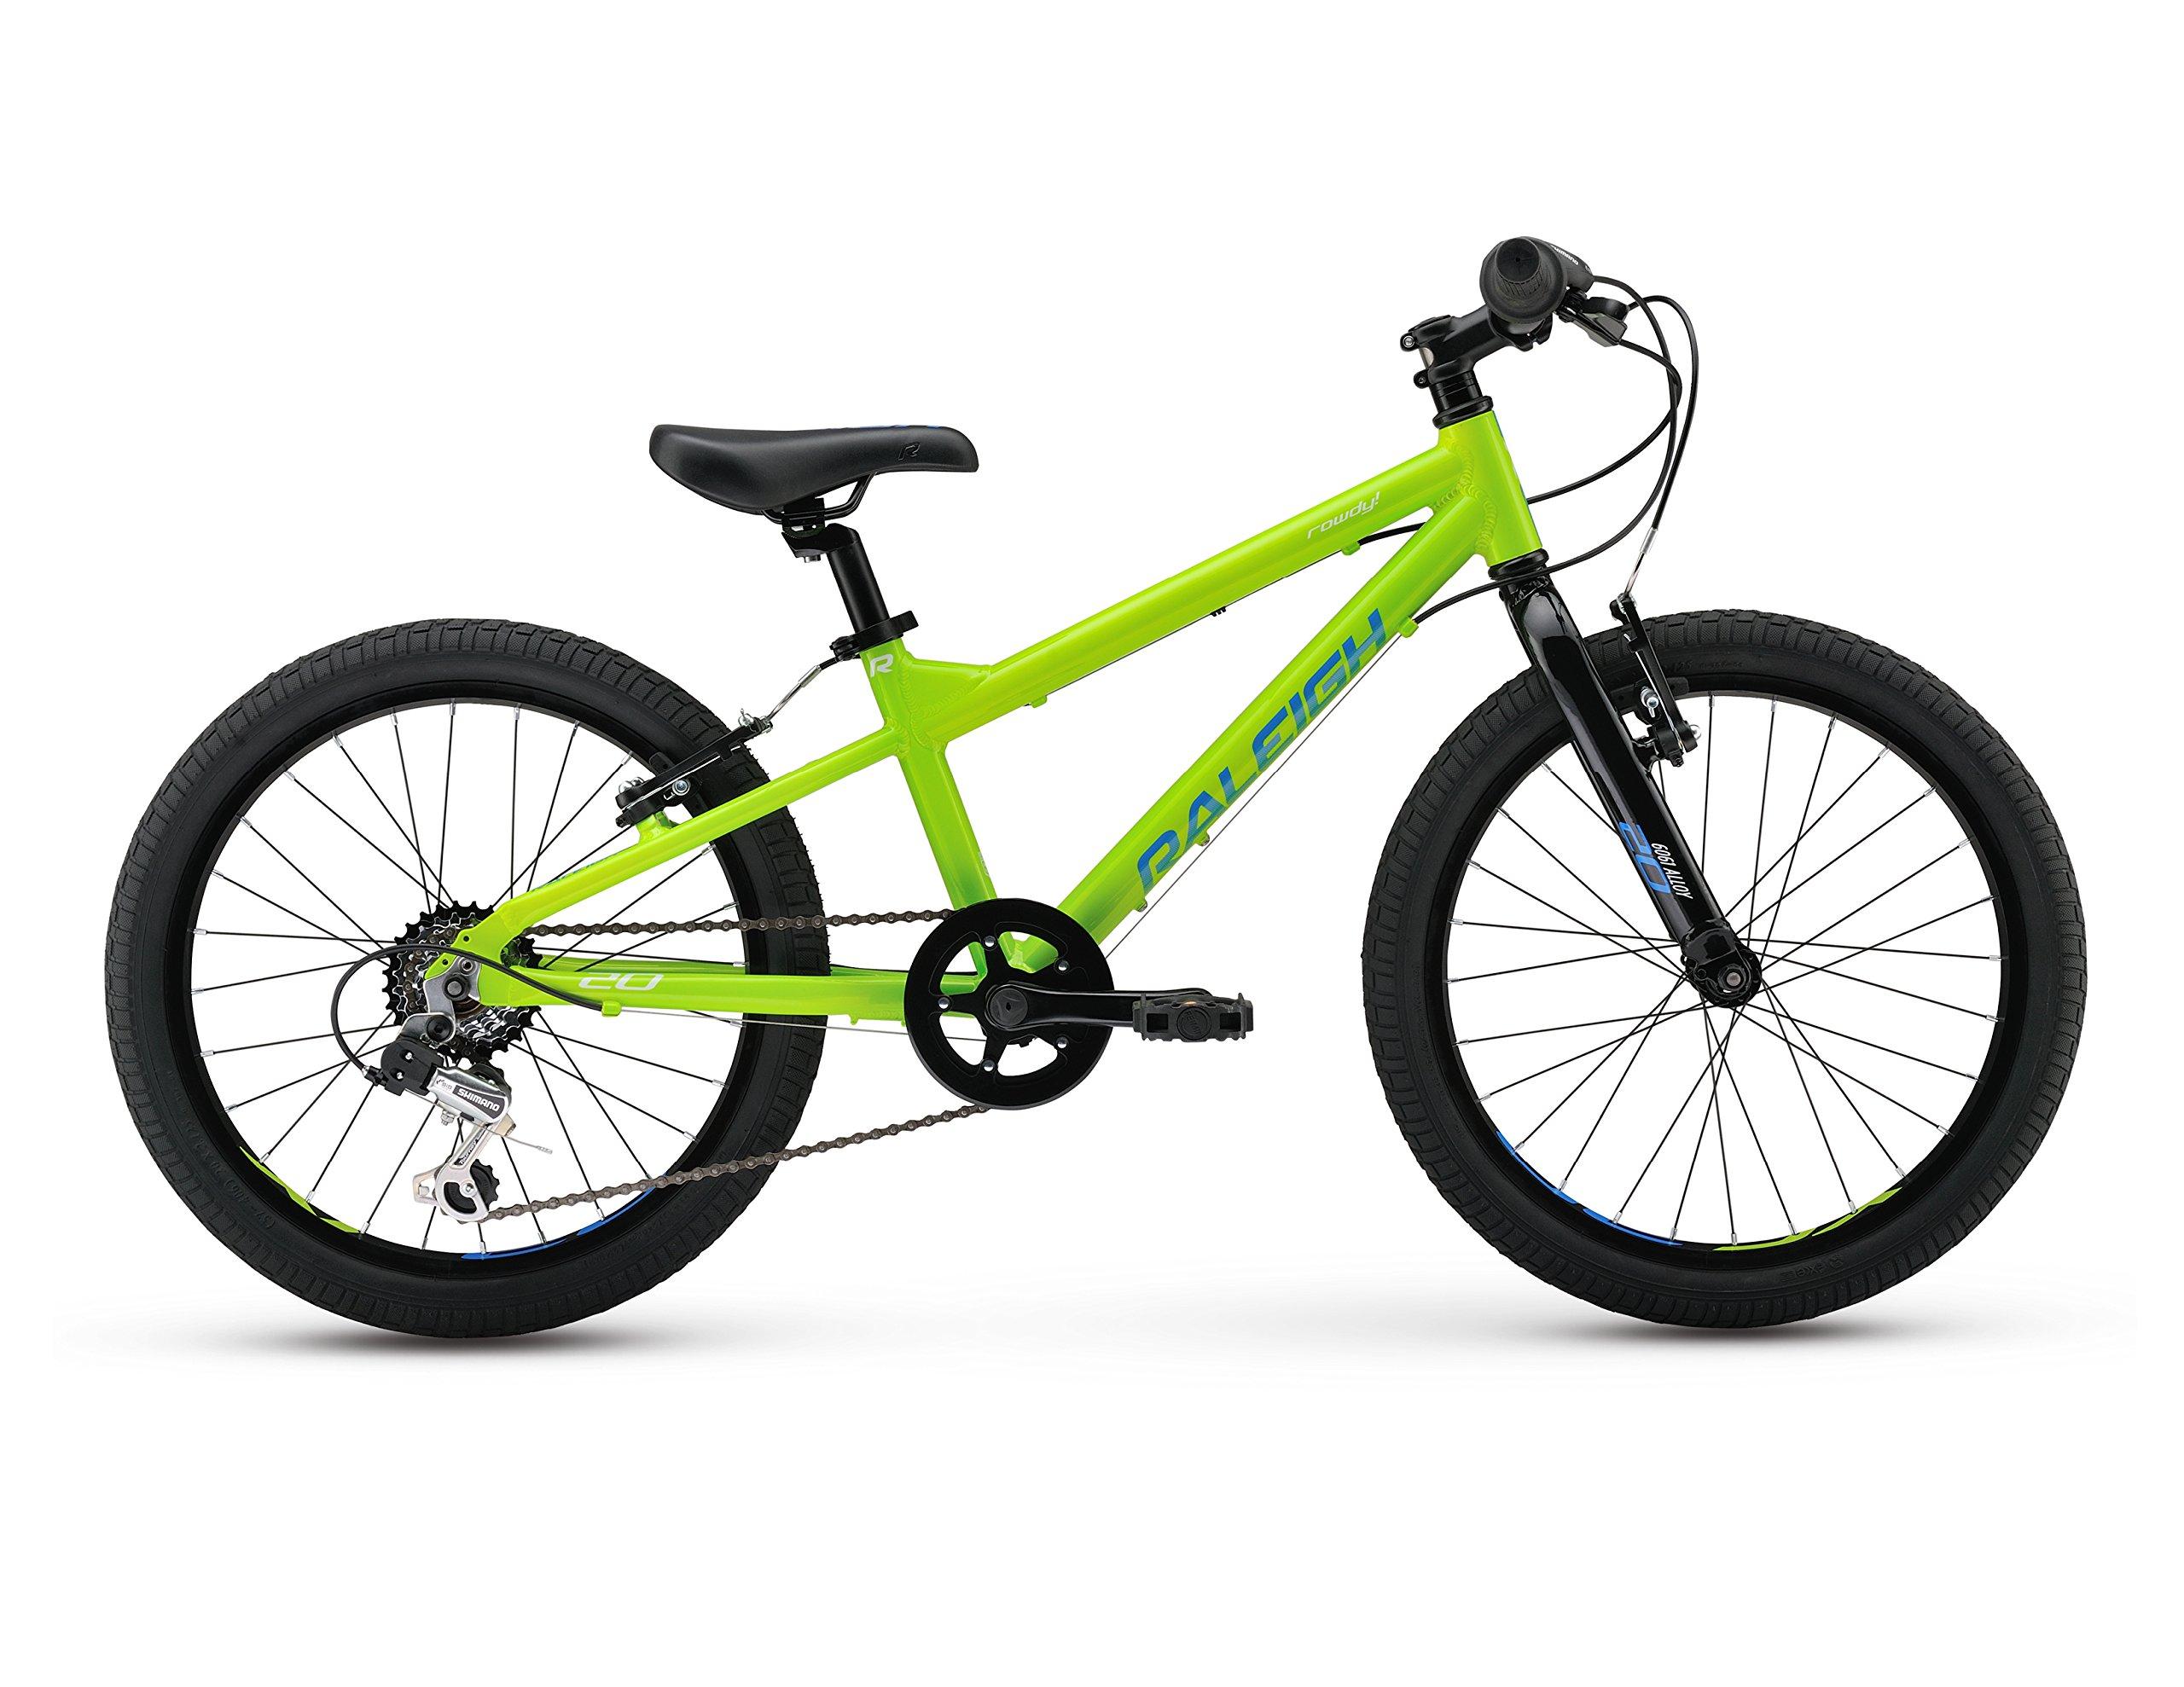 Raleigh Bikes Kids Rowdy 20 Mountain Bike, One Size, Green by Raleigh Bikes